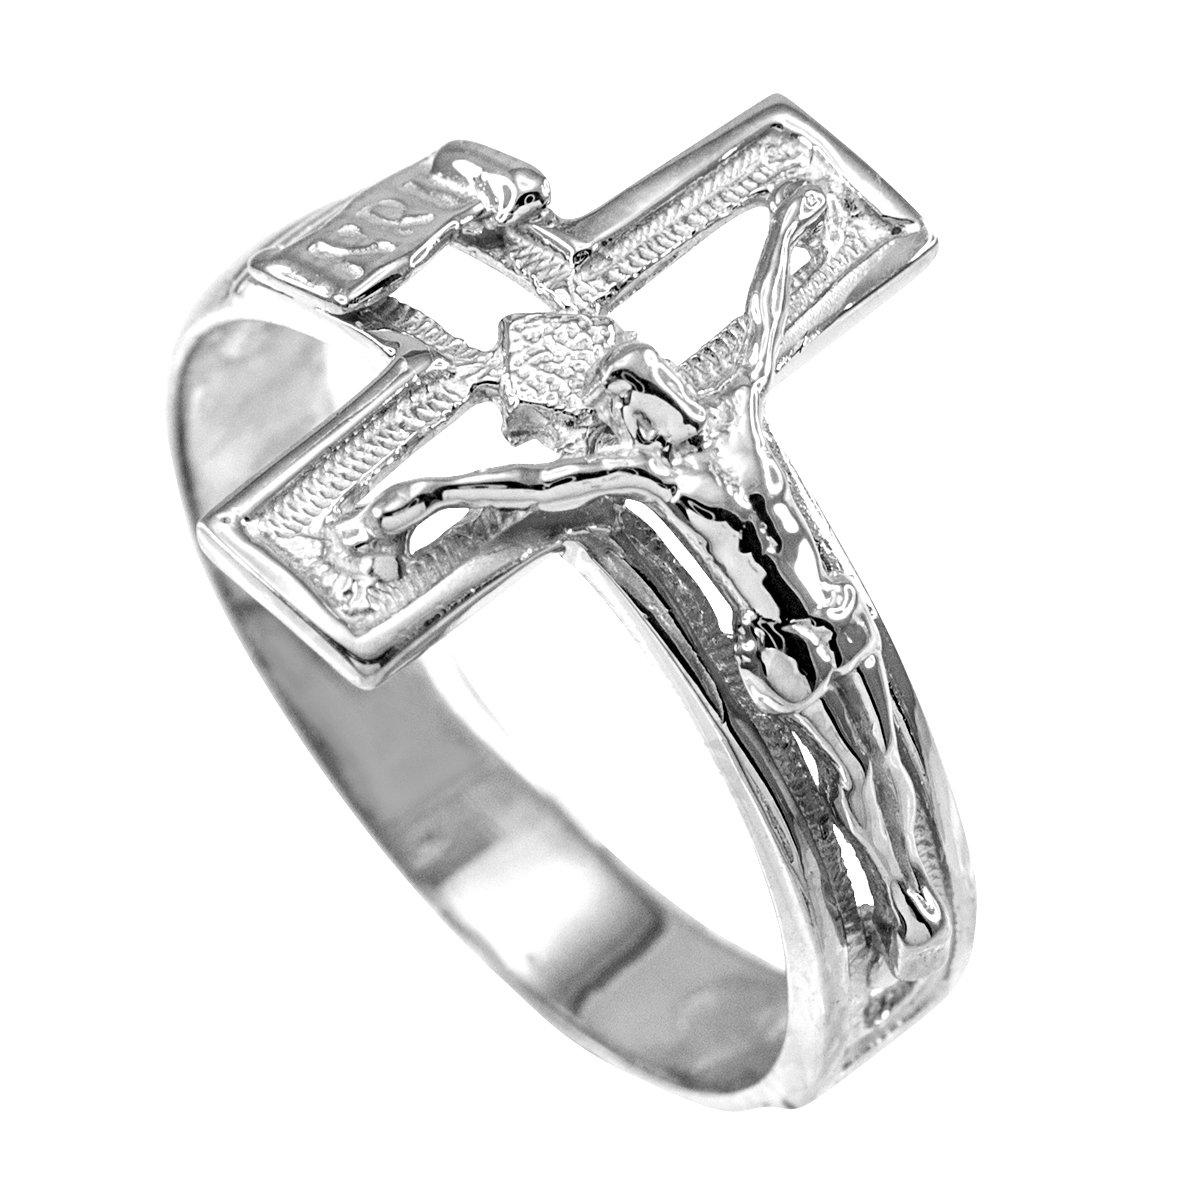 Fine 14k White Gold Open Design Cross Band Crucifix Ring (Size 7)